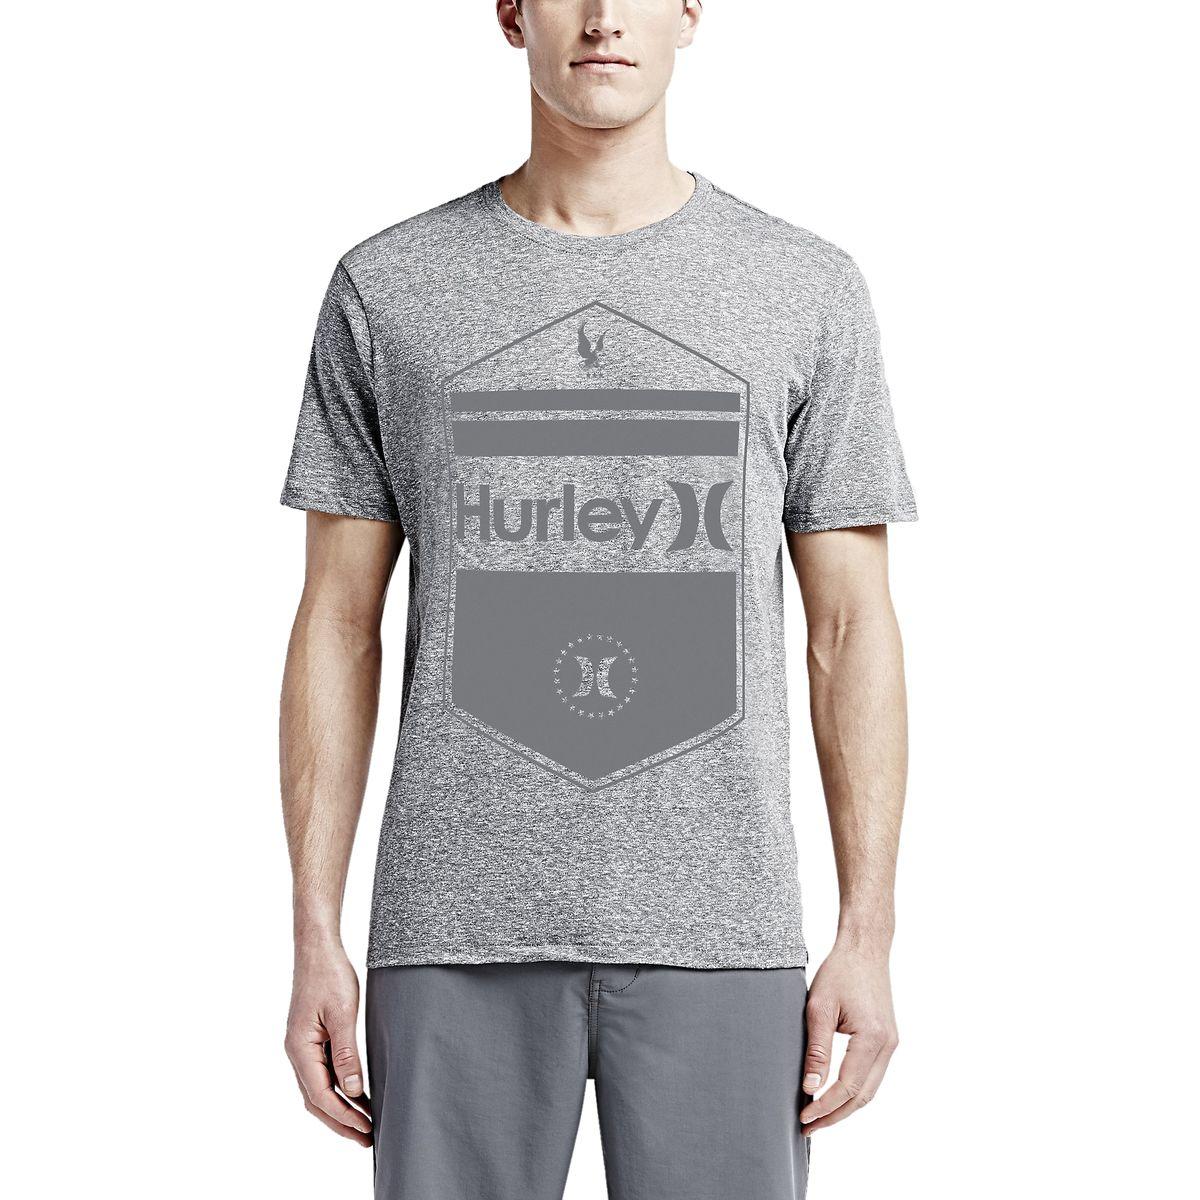 Hurley Six Points Tri-Blend Premium T-Shirt - Short-Sleeve - Men